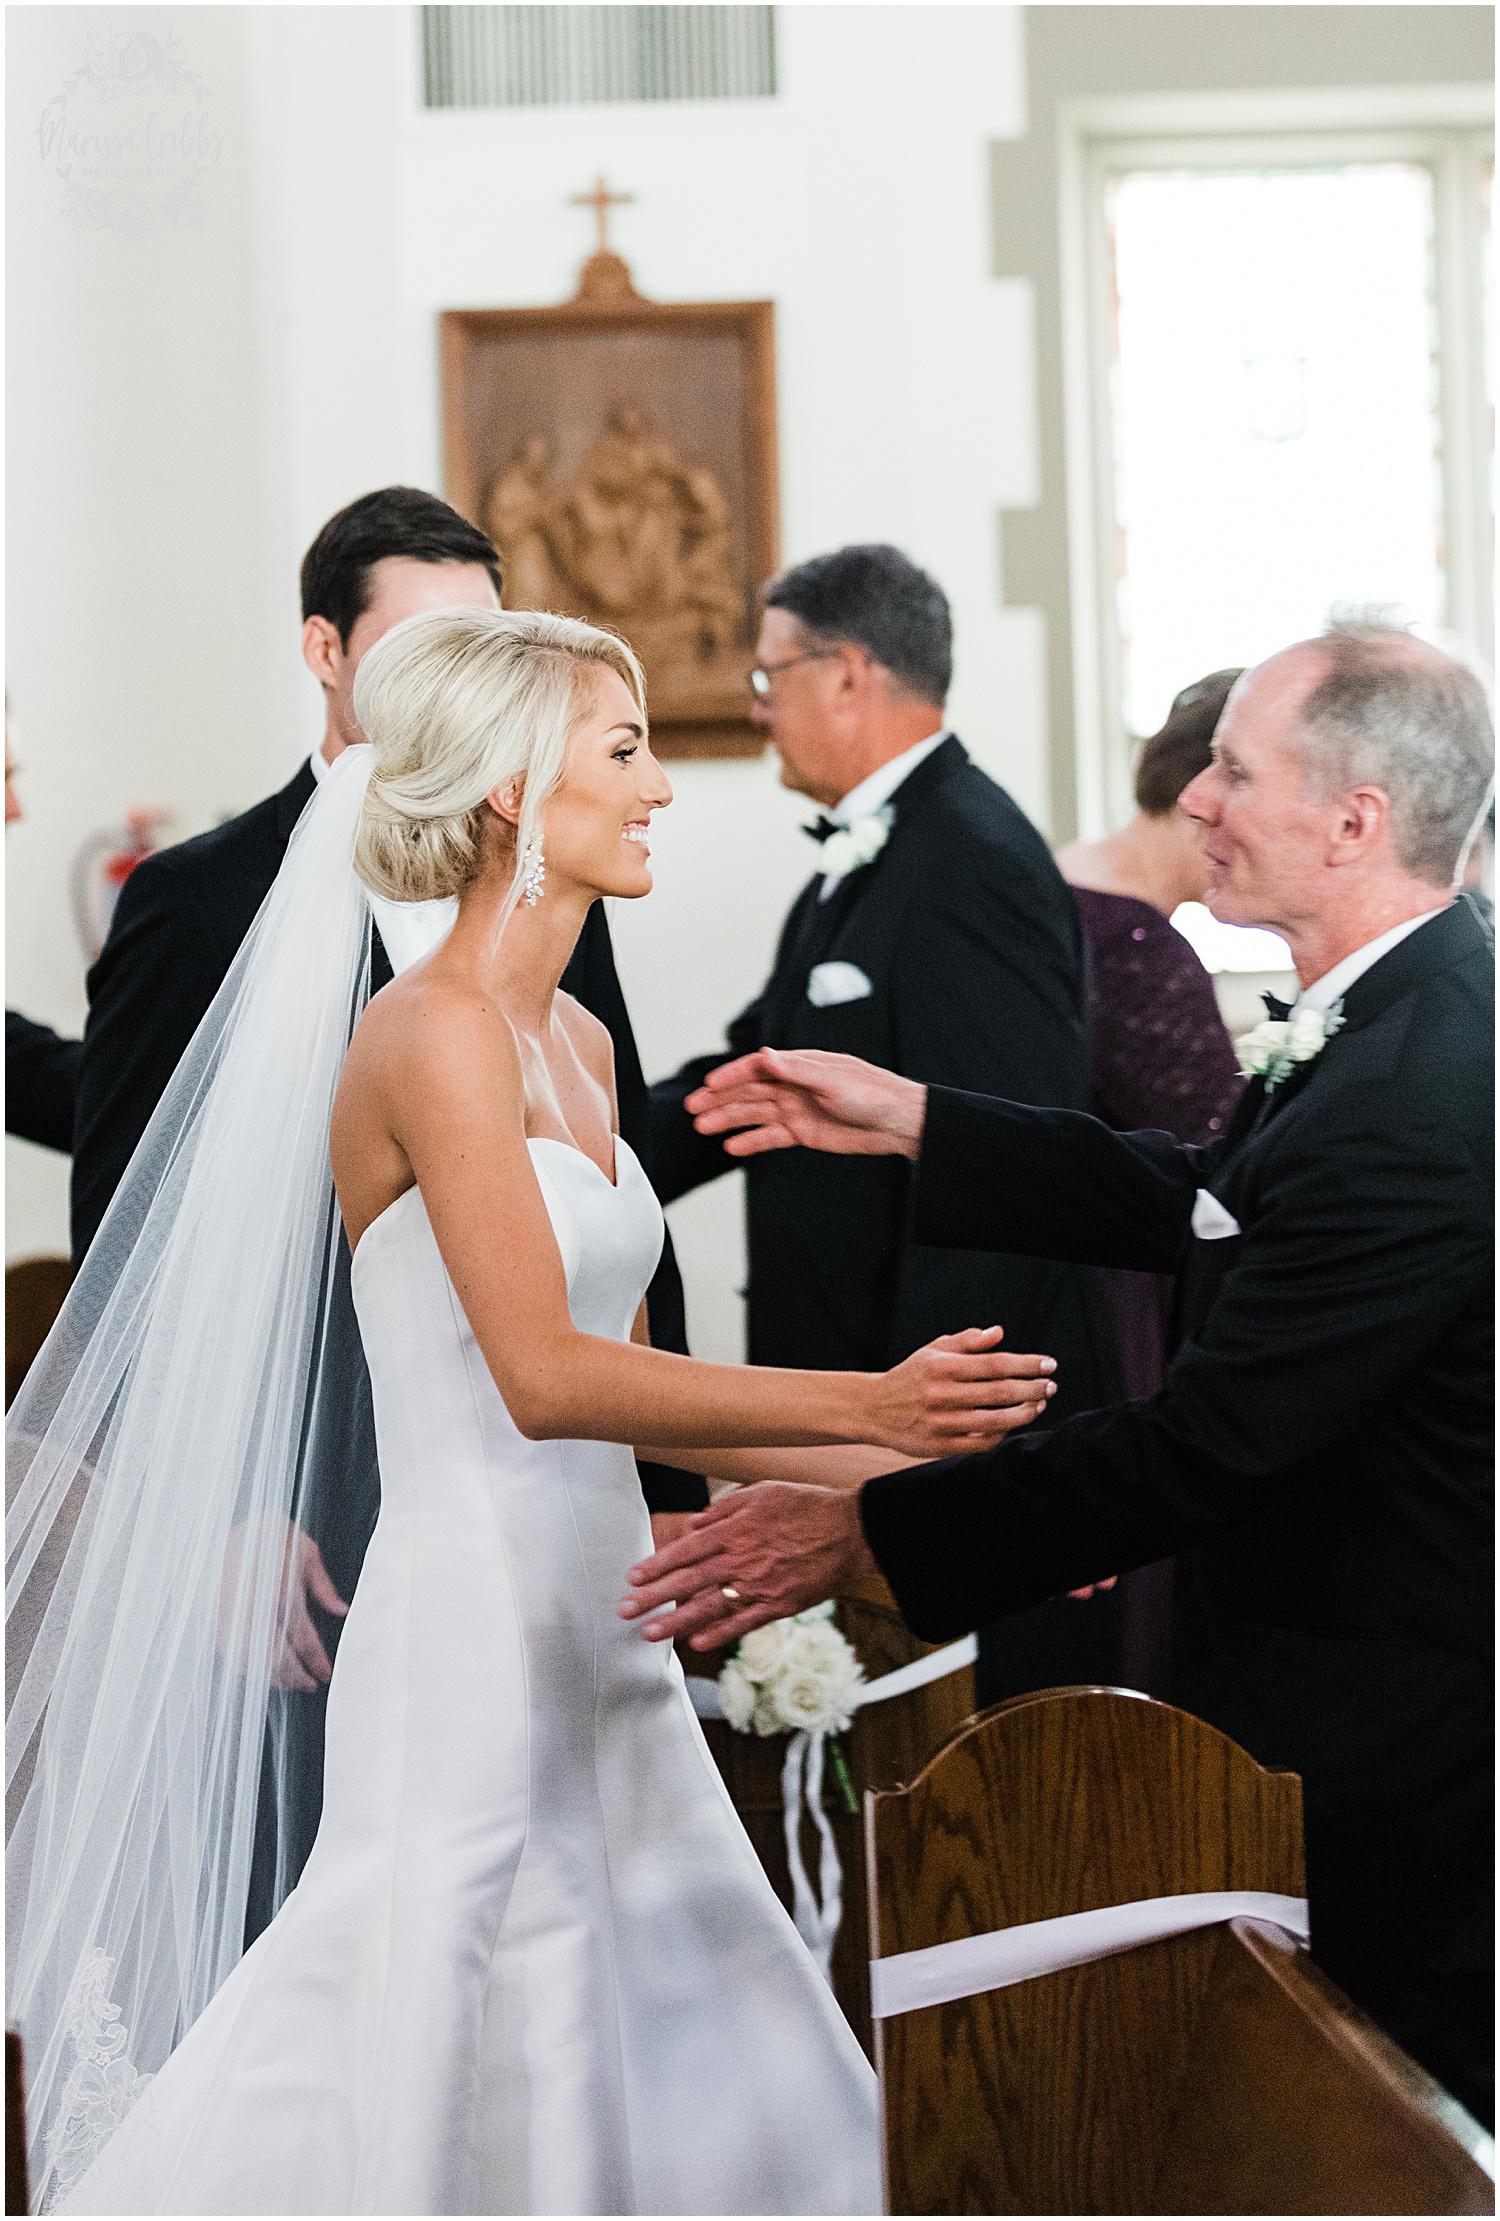 NOLL WEDDING | THE BRASS ON BALTIMORE | MARISSA CRIBBS PHOTOGRAPHY_6287.jpg